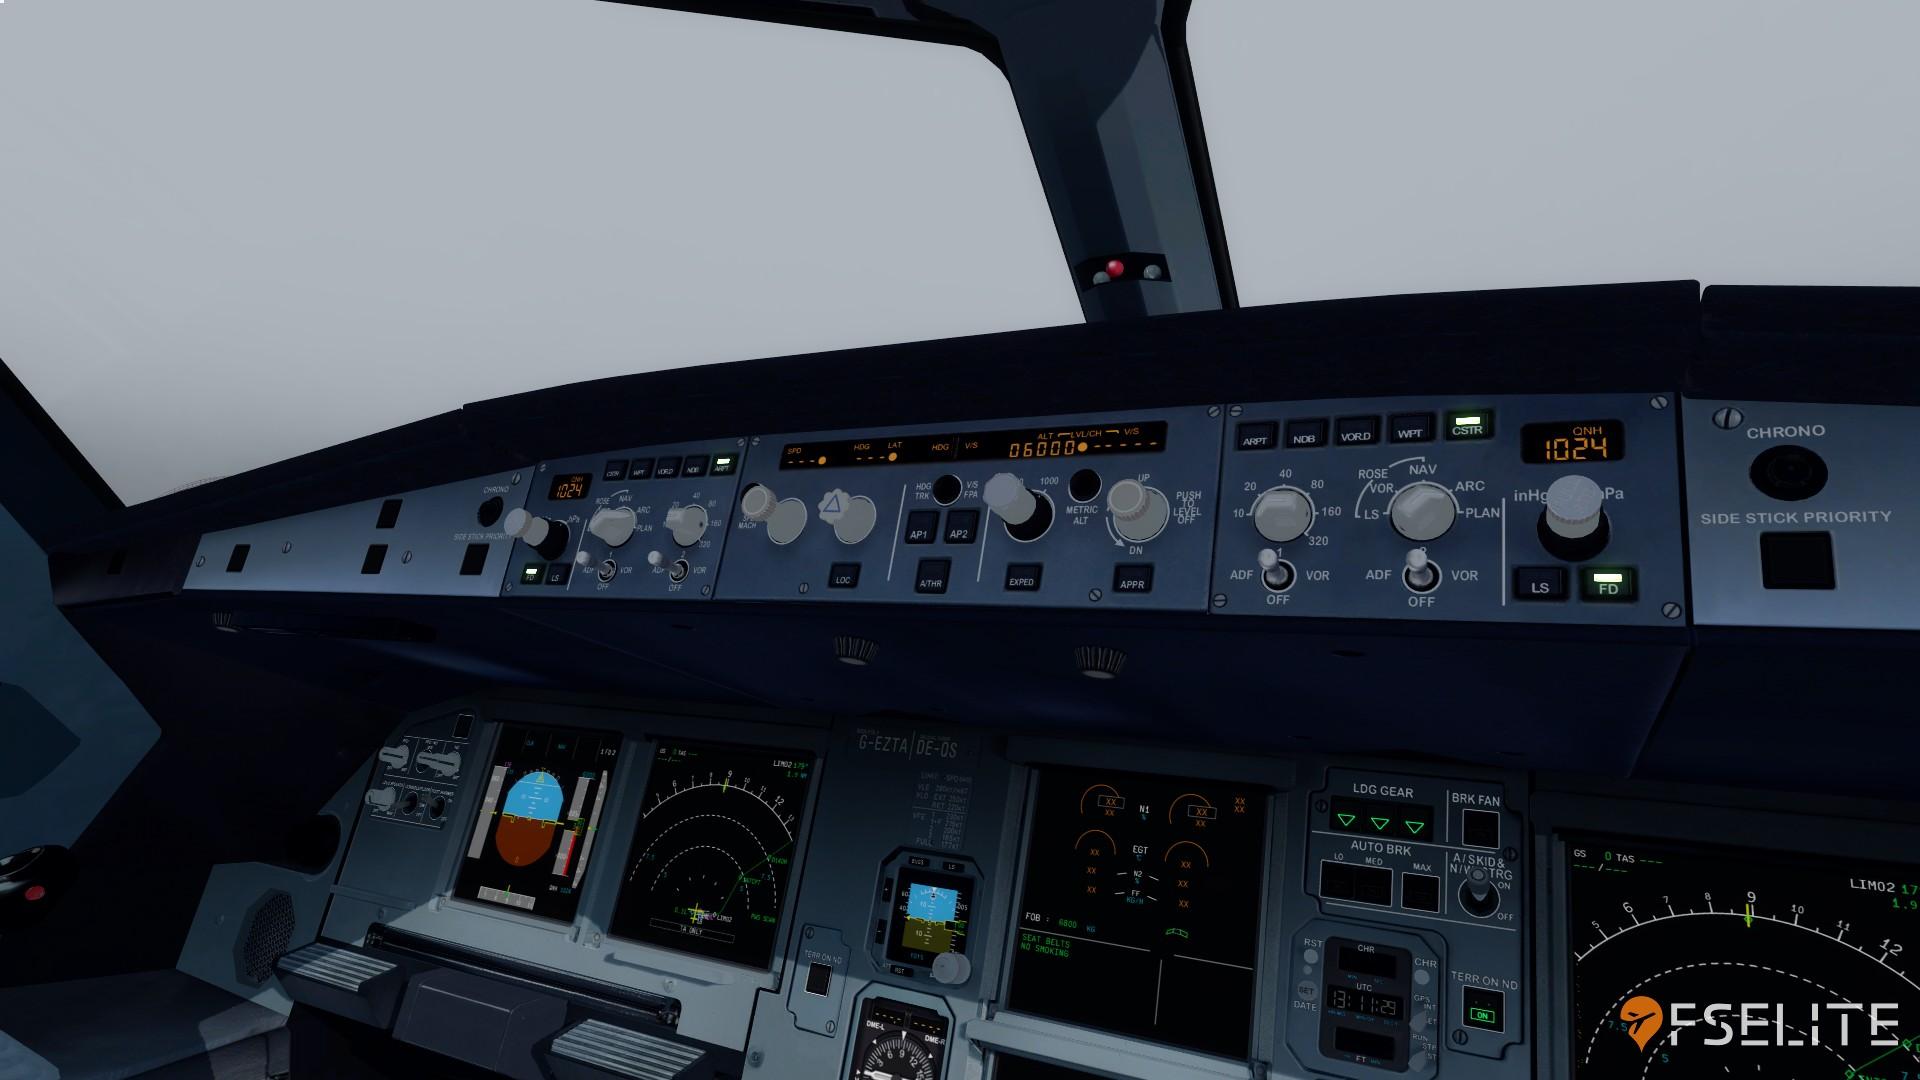 Fslabs A320 Crack - fairzenna's diary